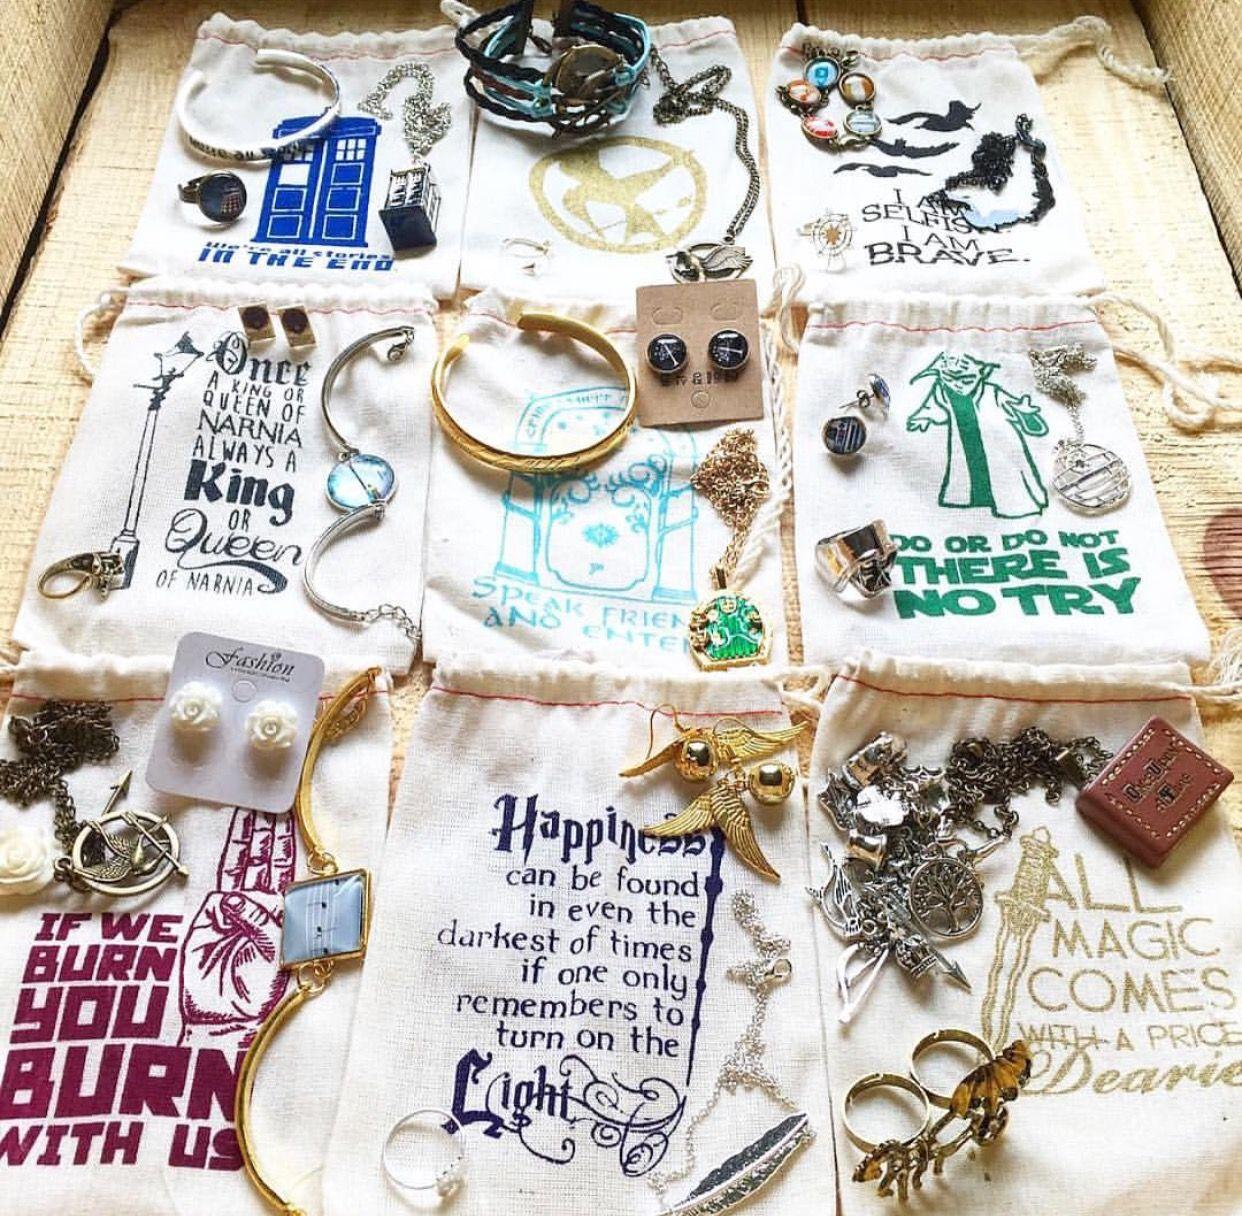 Subscription box for women: The ORIGINAL fandom jewelry club! 3-4 pieces of fandom inspired jewelry, only $13! #subscriptionbox #forwomen #fandom #jewelry ...